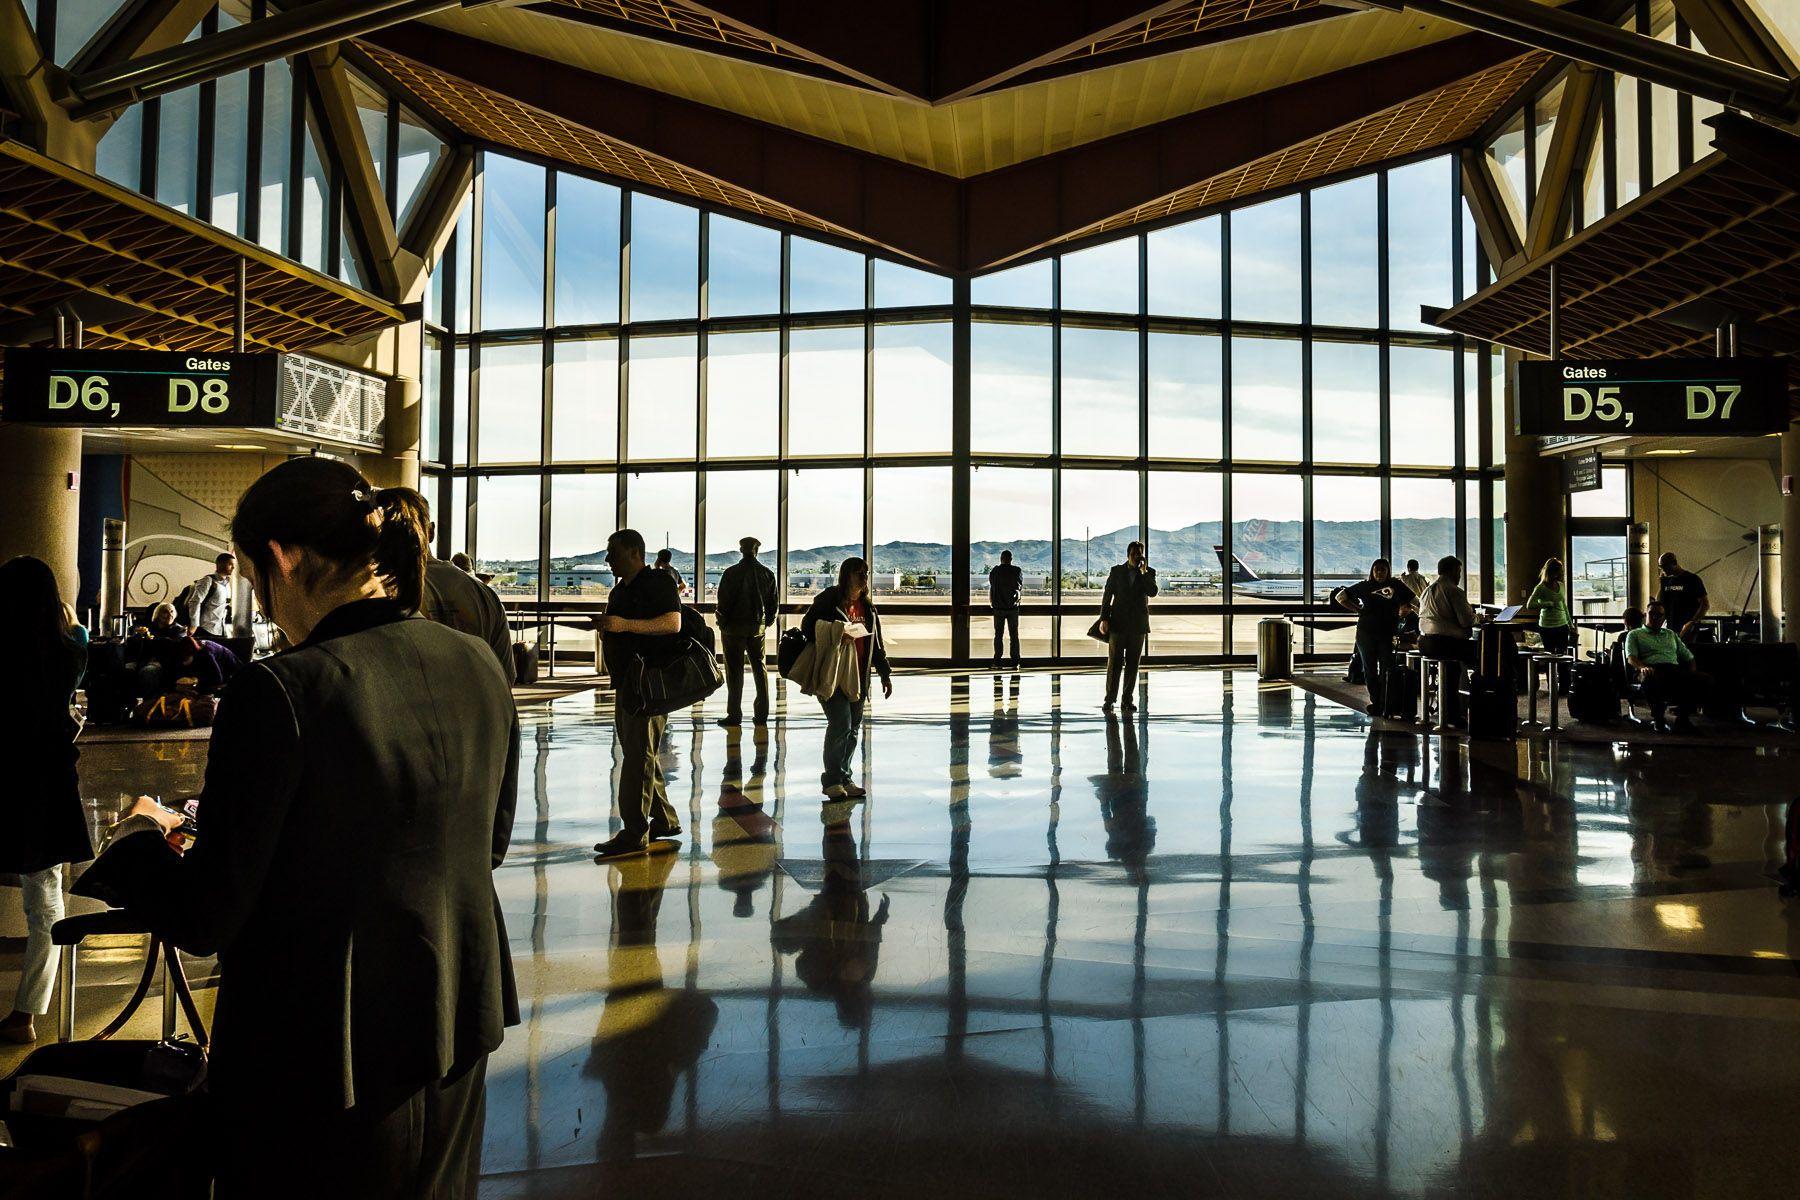 Sky Harbor airport, Phoenix, Arizona.